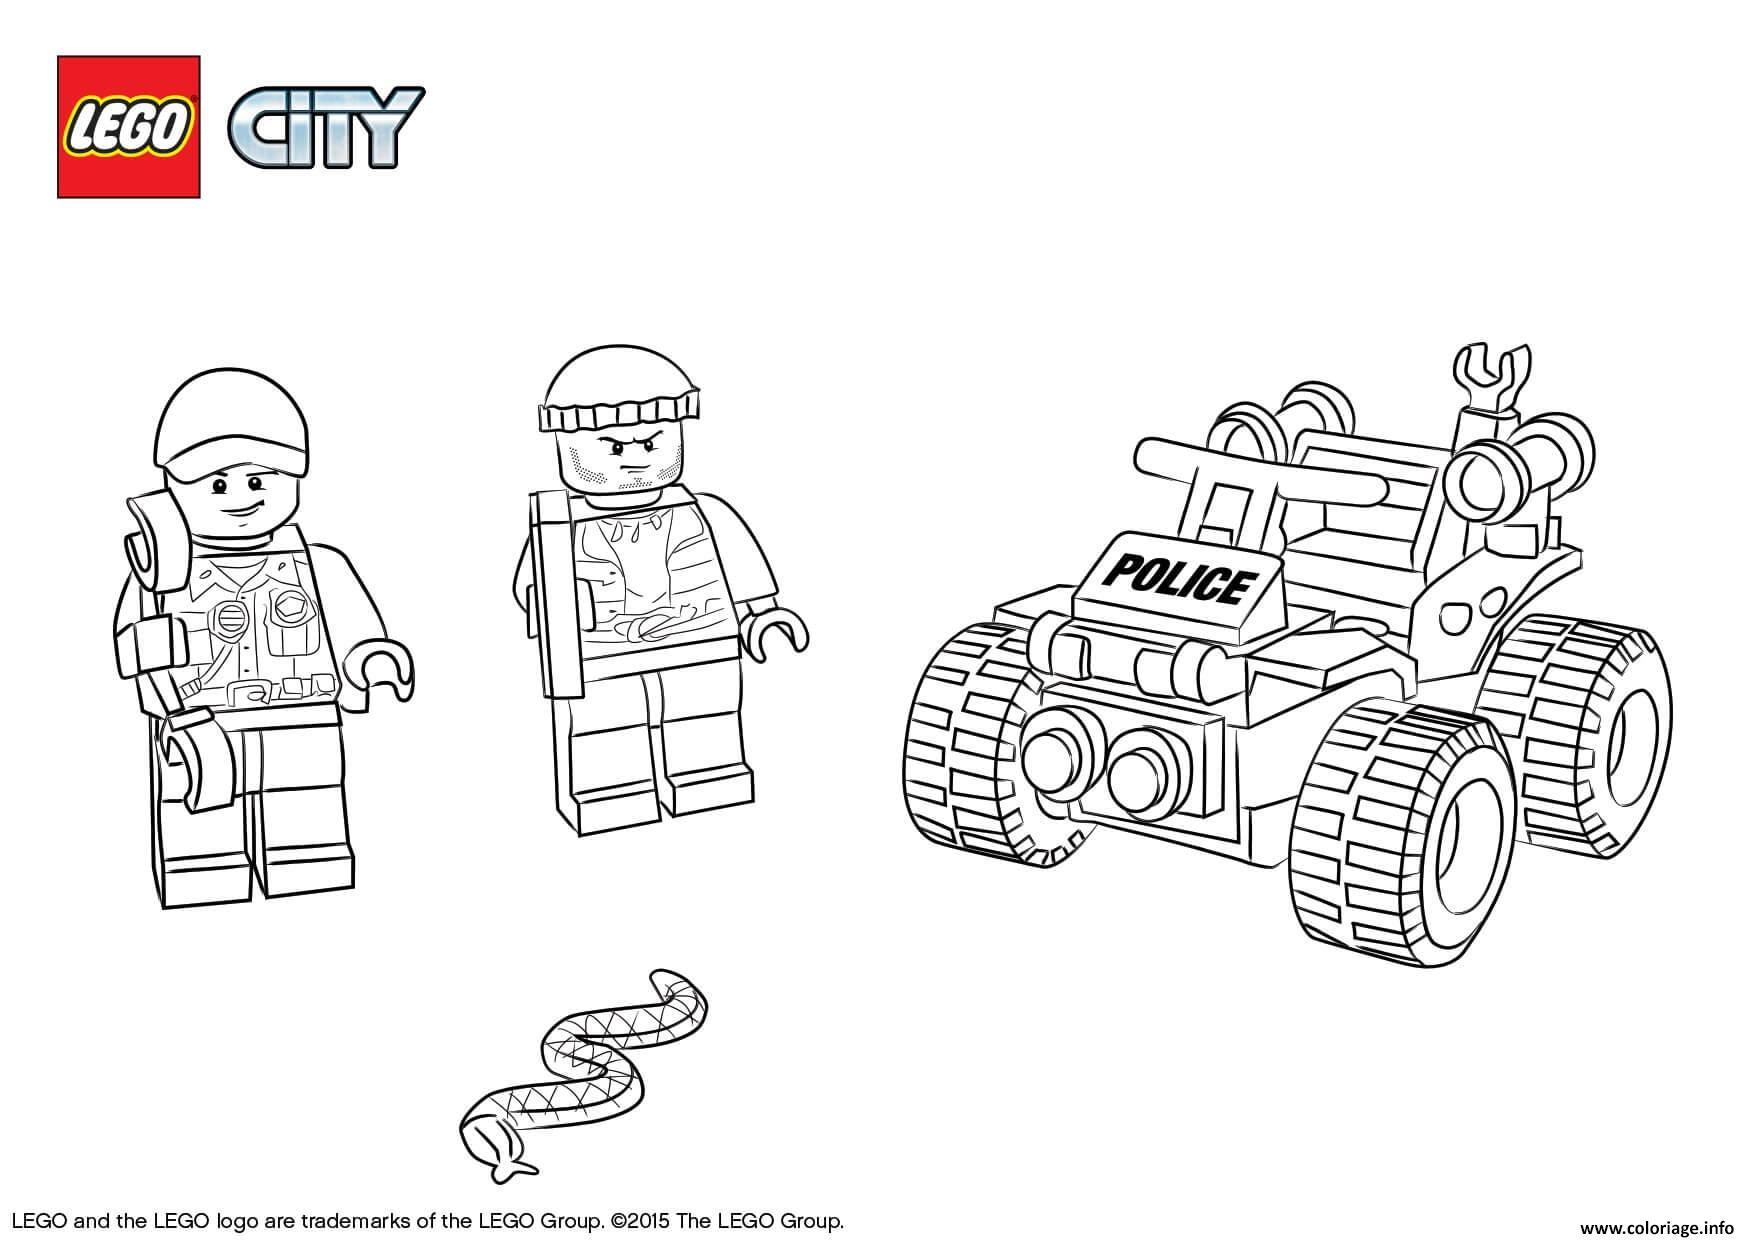 Coloriage Lego City Atv Patrol Police Dessin Lego City A Imprimer